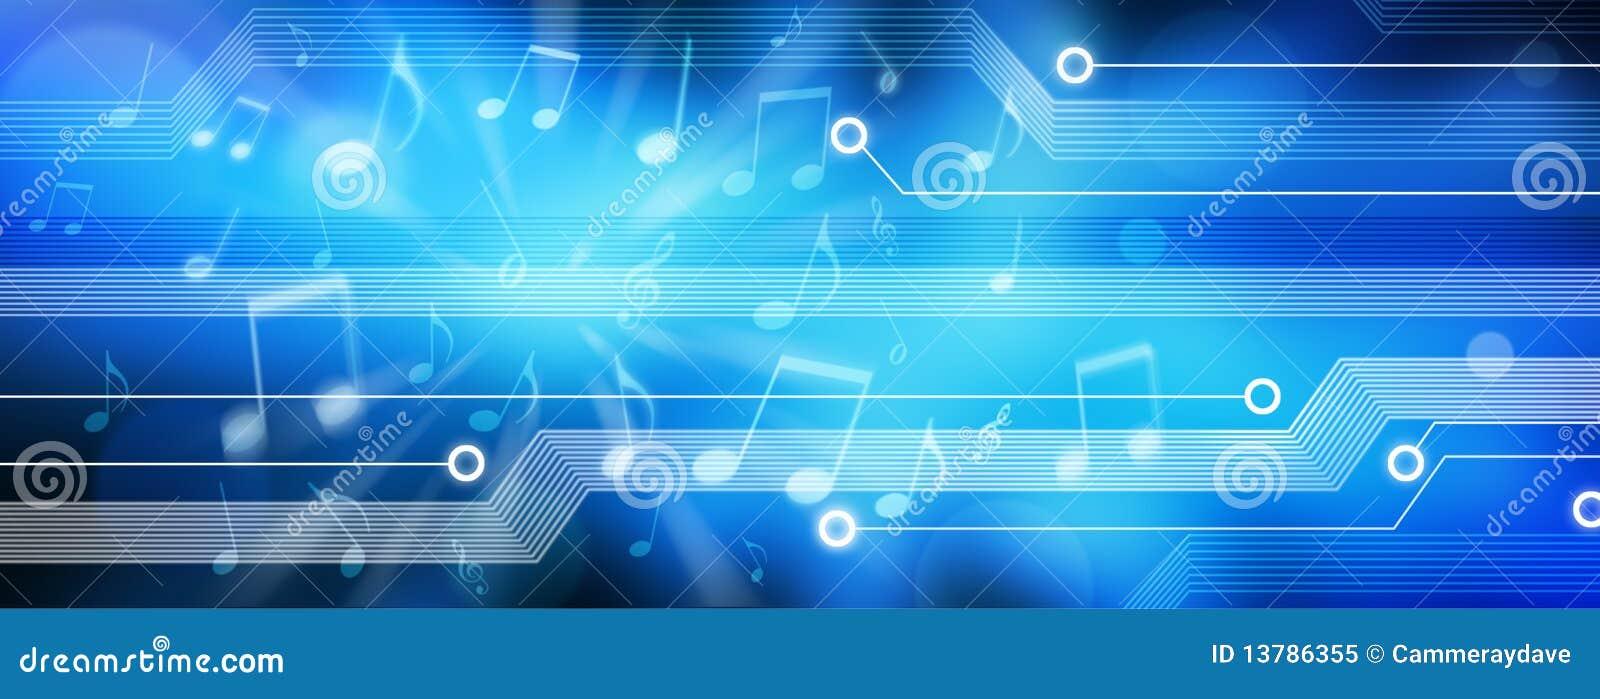 Panorama do fundo da música